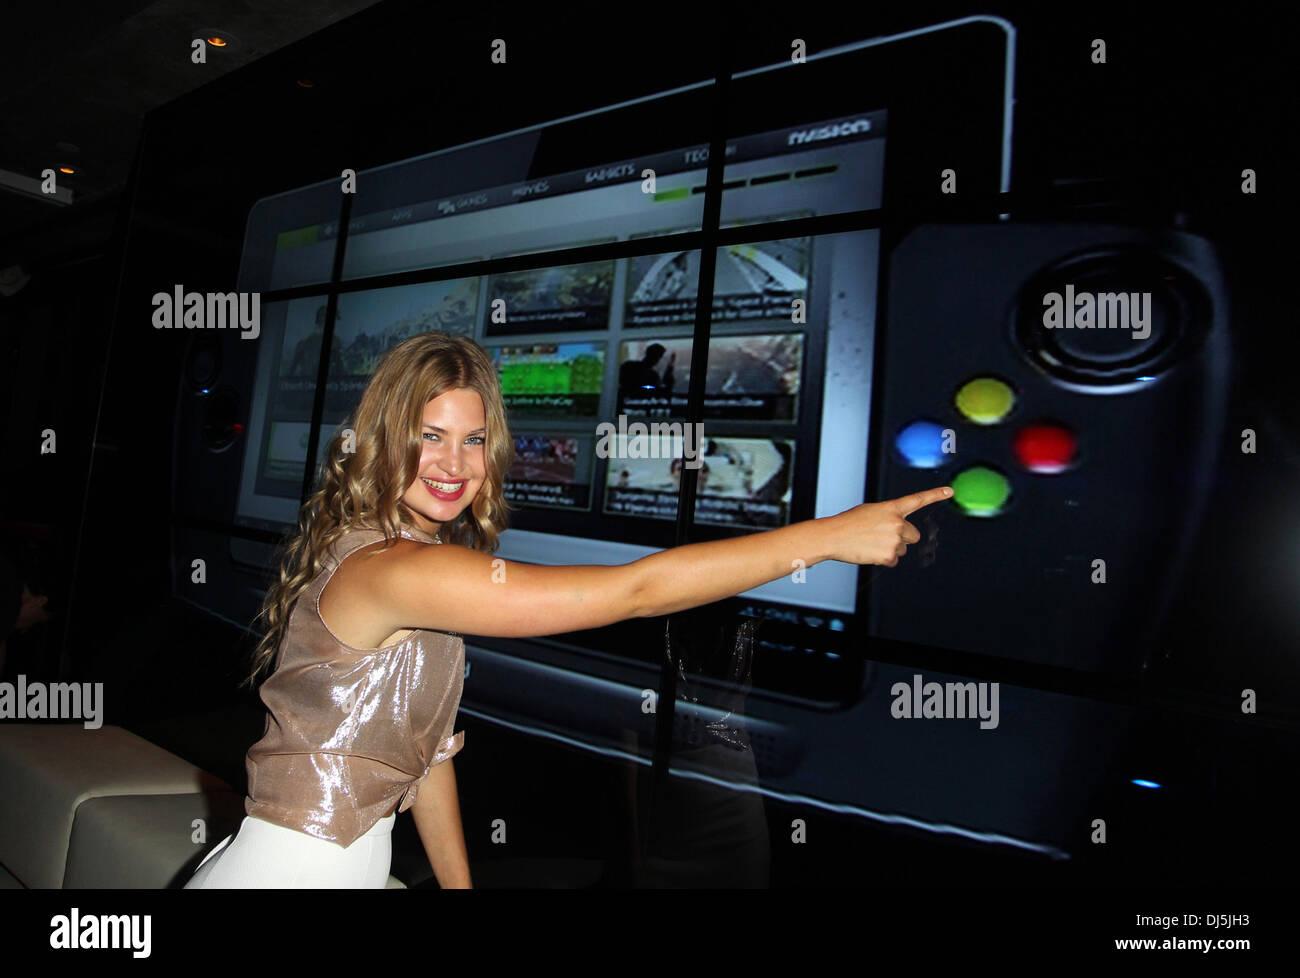 Jennifer Akerman Wikipad and Nvidia host E3 2012 VIP red